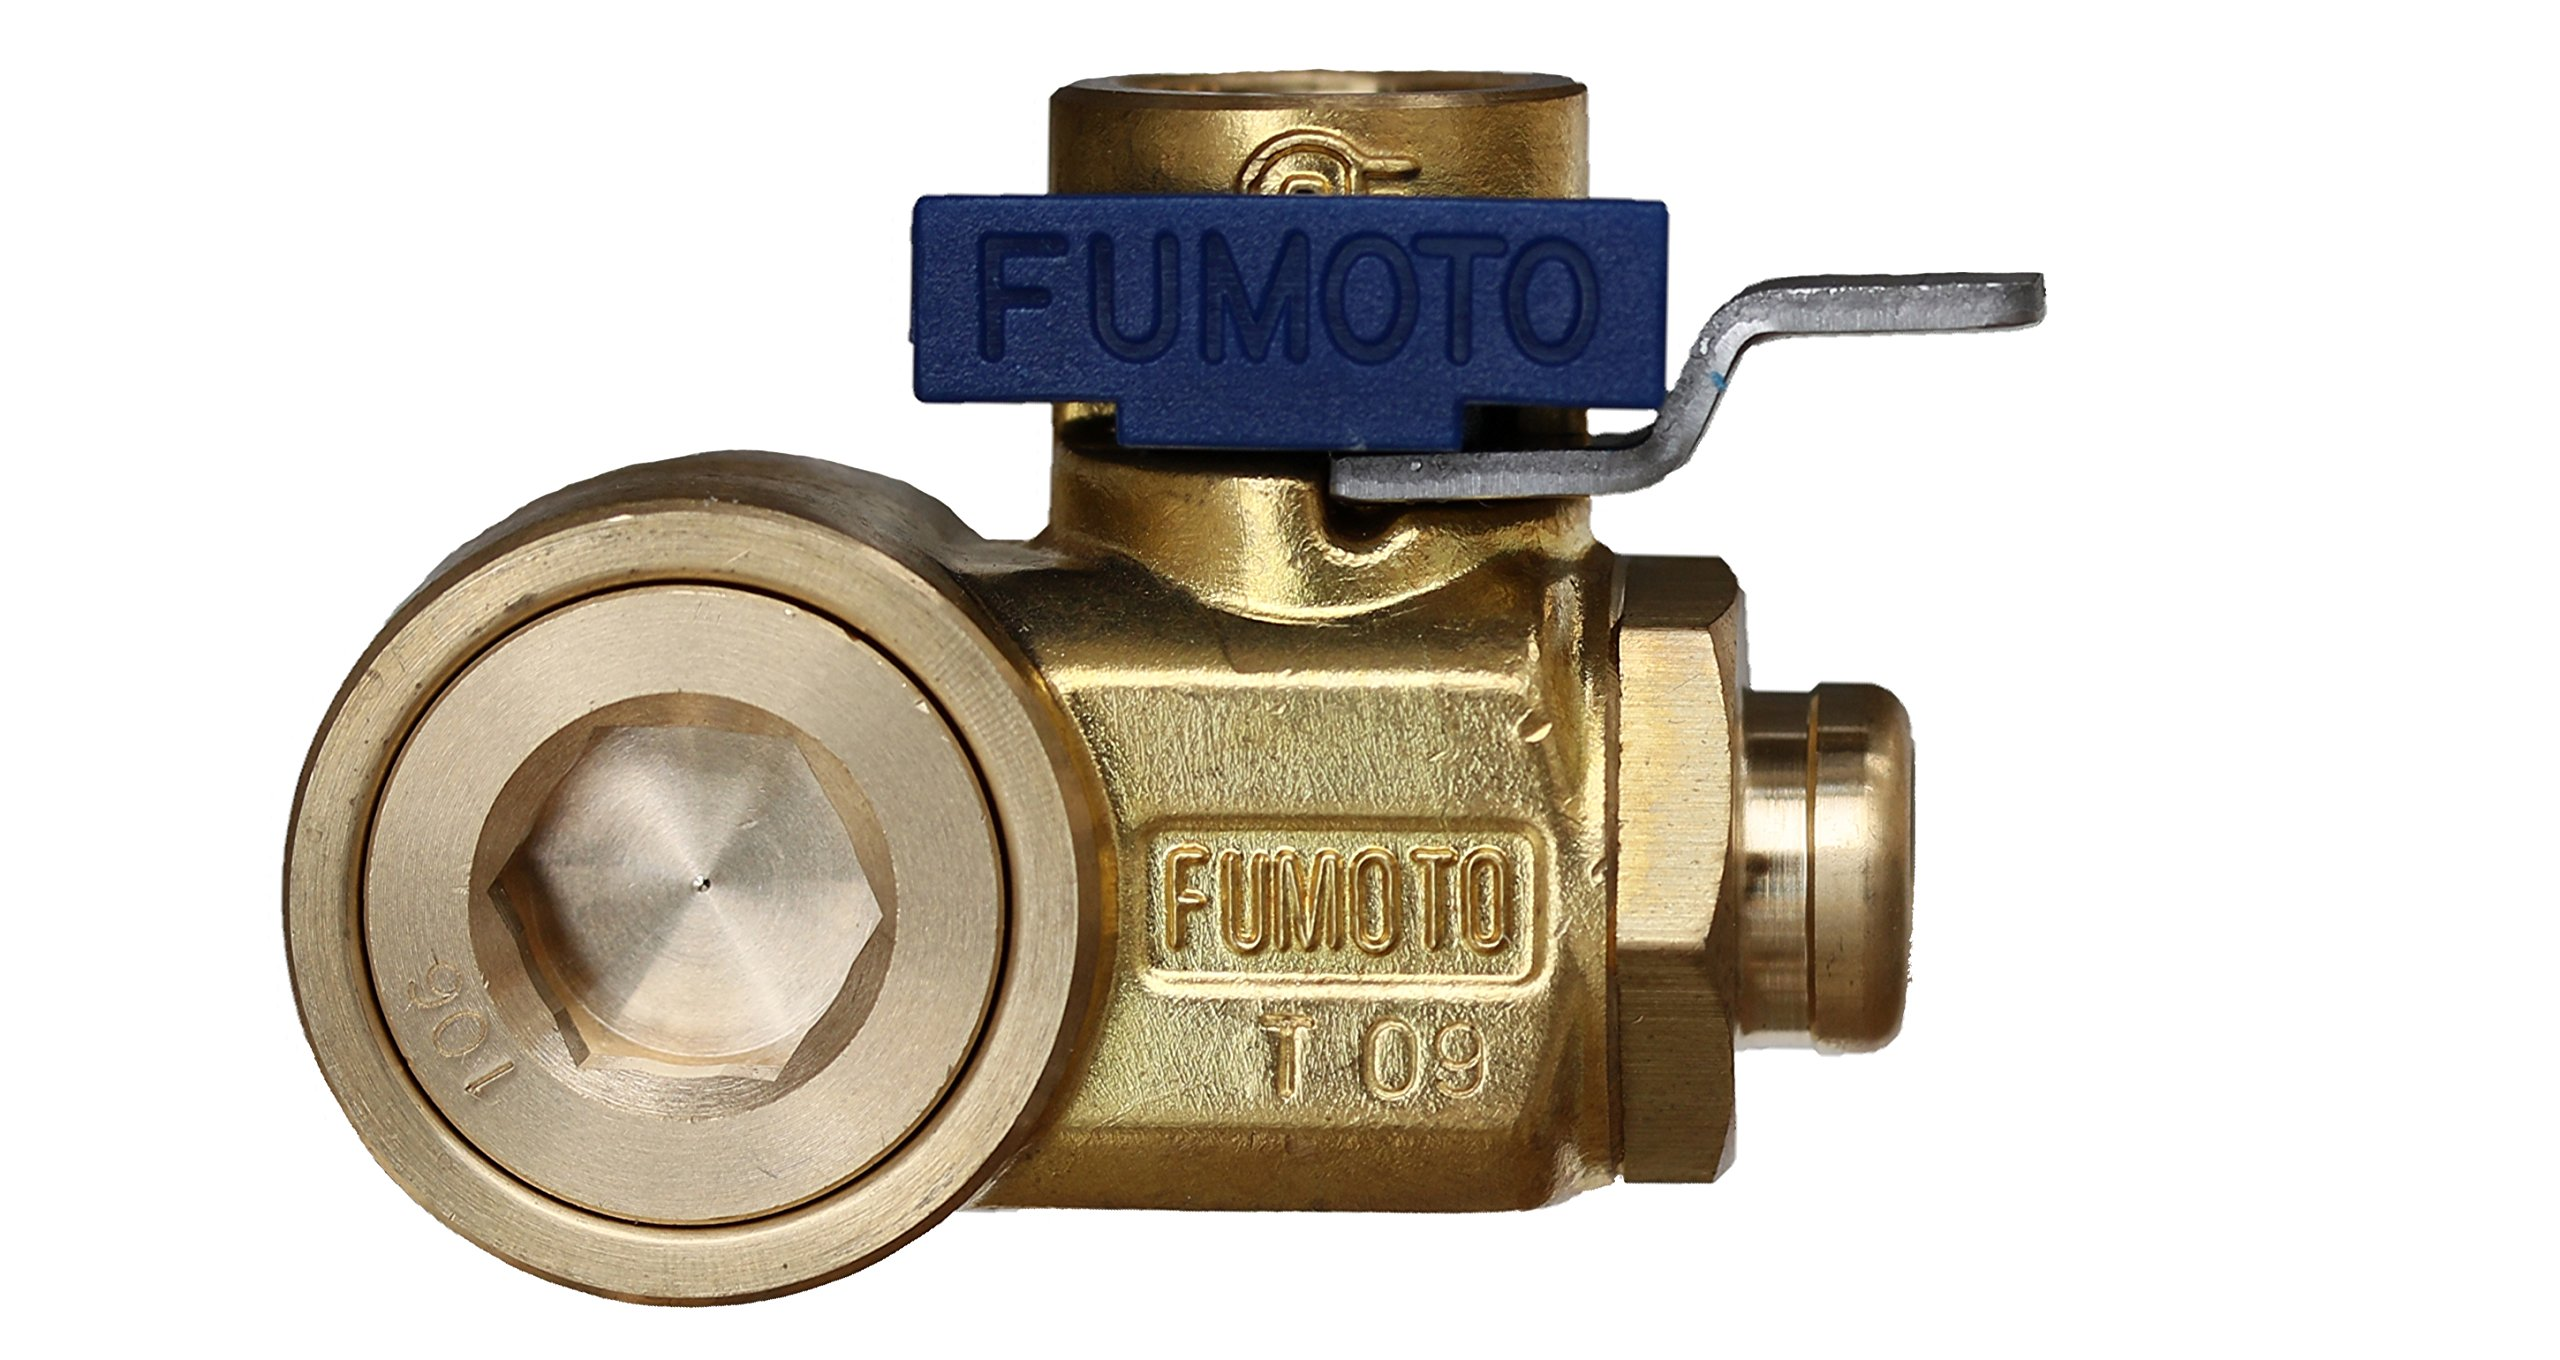 Fumoto B111SX BSX-Series Engine Oil Drain Valve, 1 Pack by Fumoto